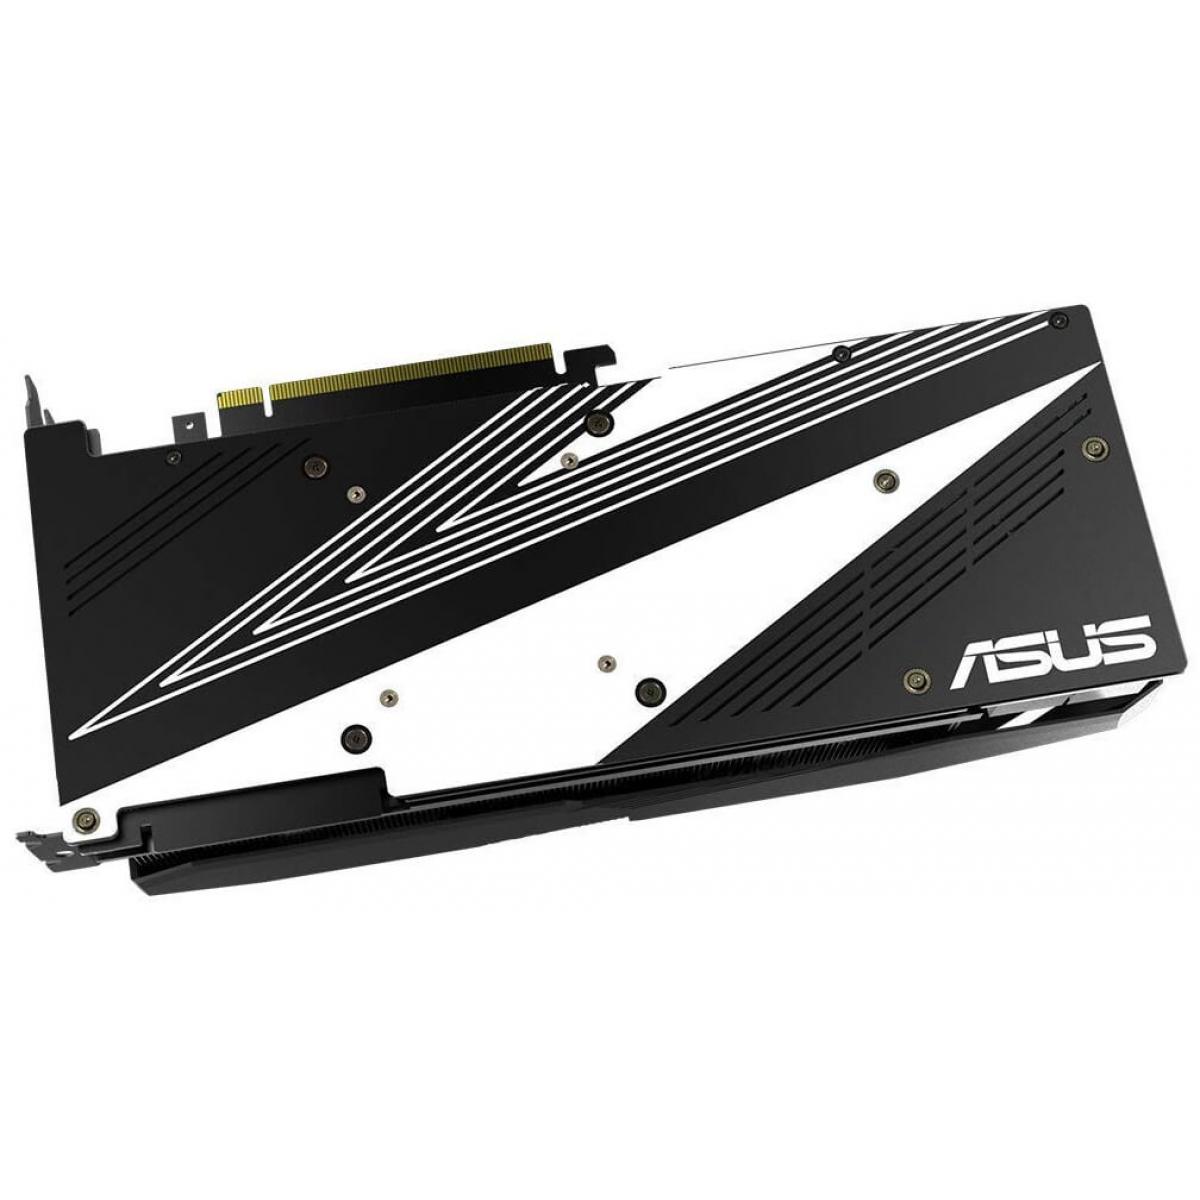 Placa de Vídeo Asus Geforce RTX 2080 Ti DUAL OC, 11GB GDDR6, 352Bit, DUAL-RTX2080TI-O11G